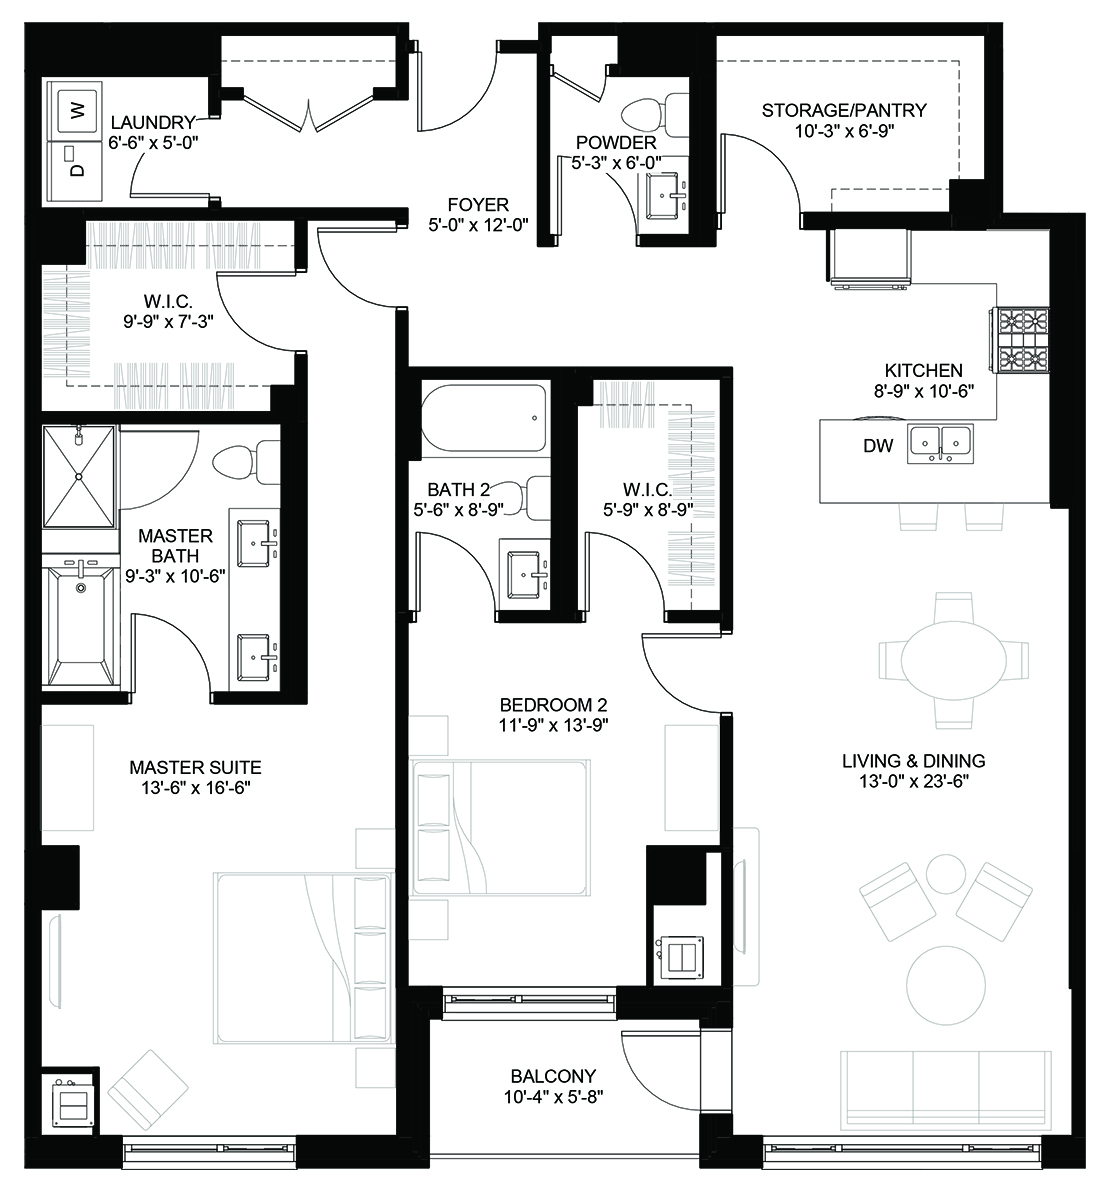 209_309_409_Floorplan.jpg